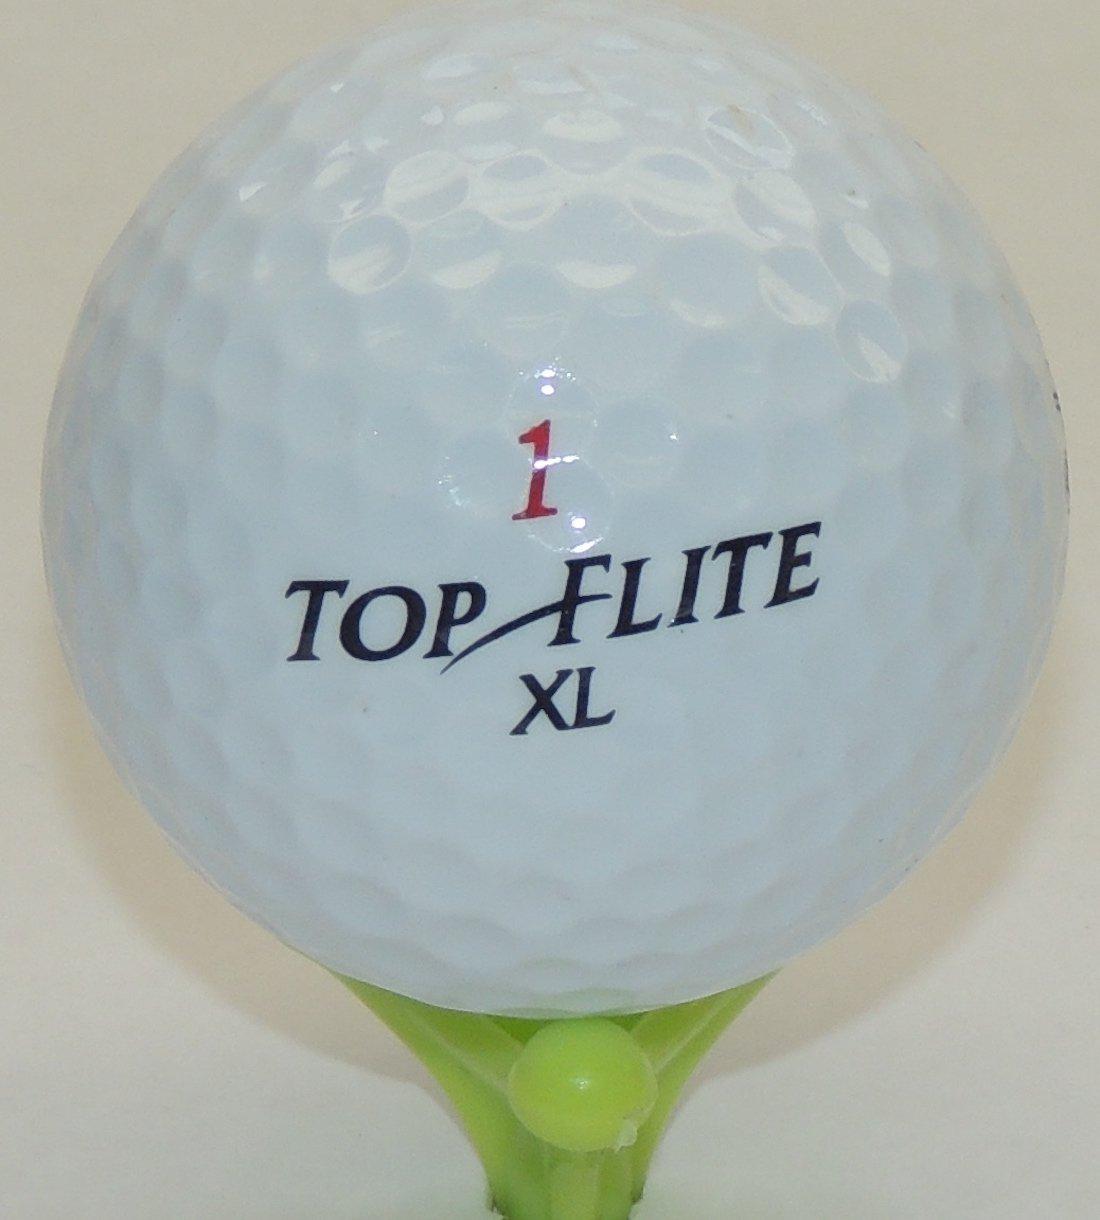 36 top-flite Grade AリサイクルゴルフボールギフトボックスFree Tee 's &磁気Smiley Faceゴルフボールマーカー/帽子クリップ   B00EW31EW4